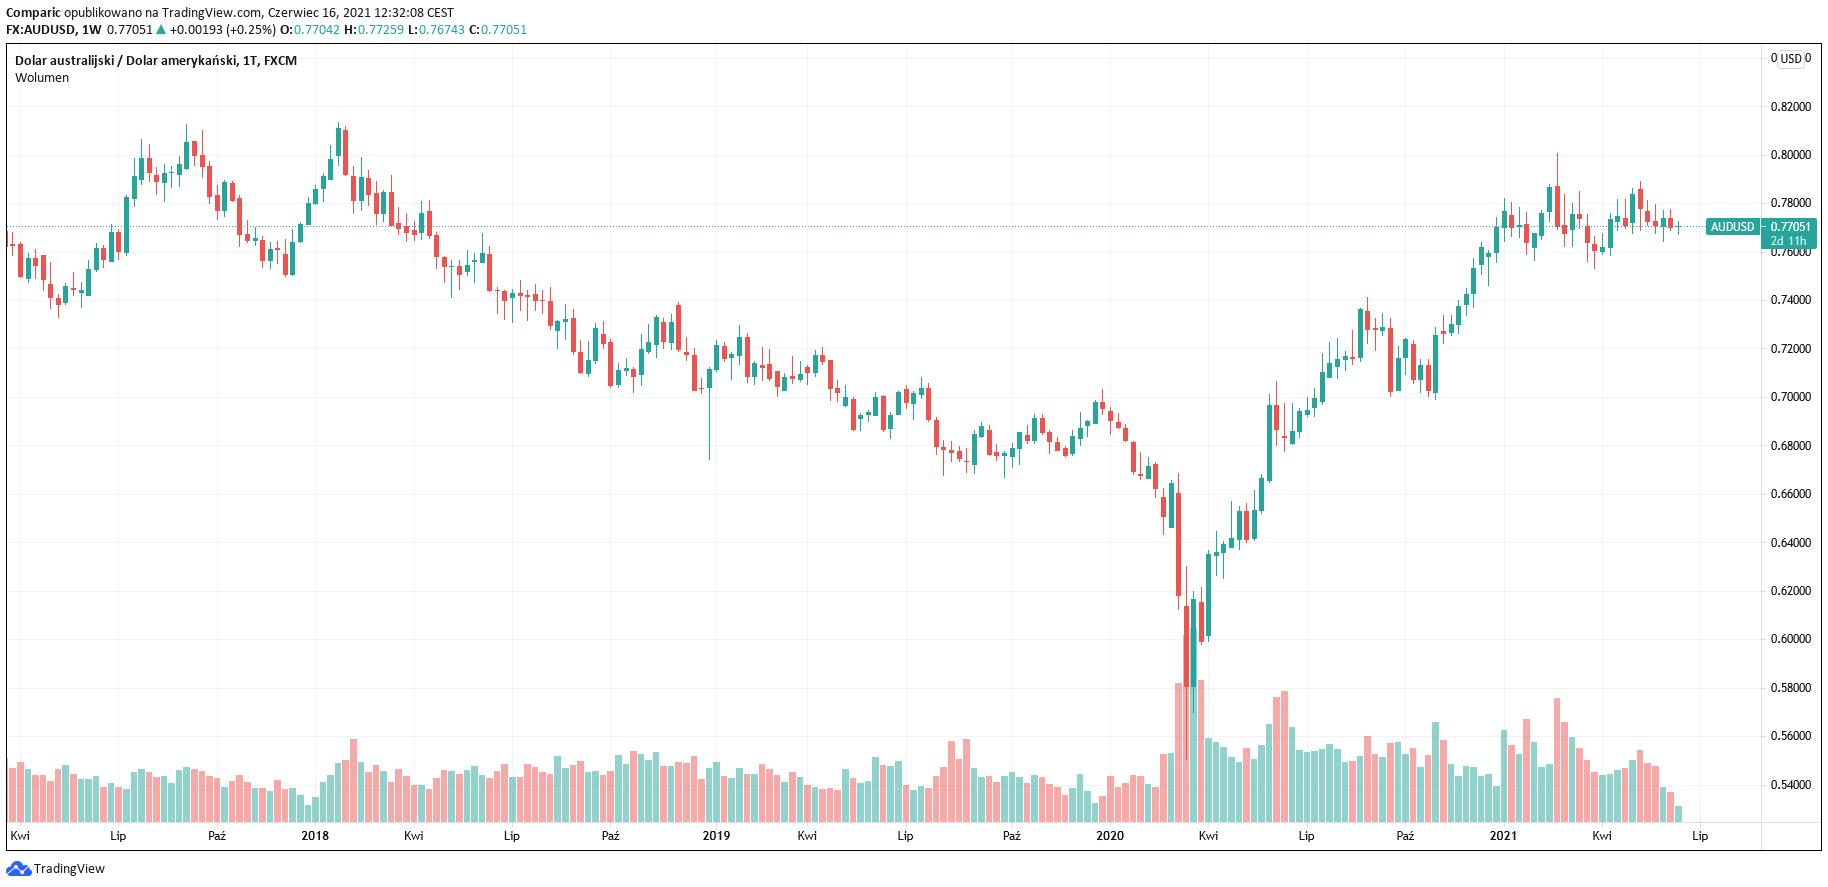 Kursy walut: funt, euro, dolar, jen, dolar według prognoz SEB